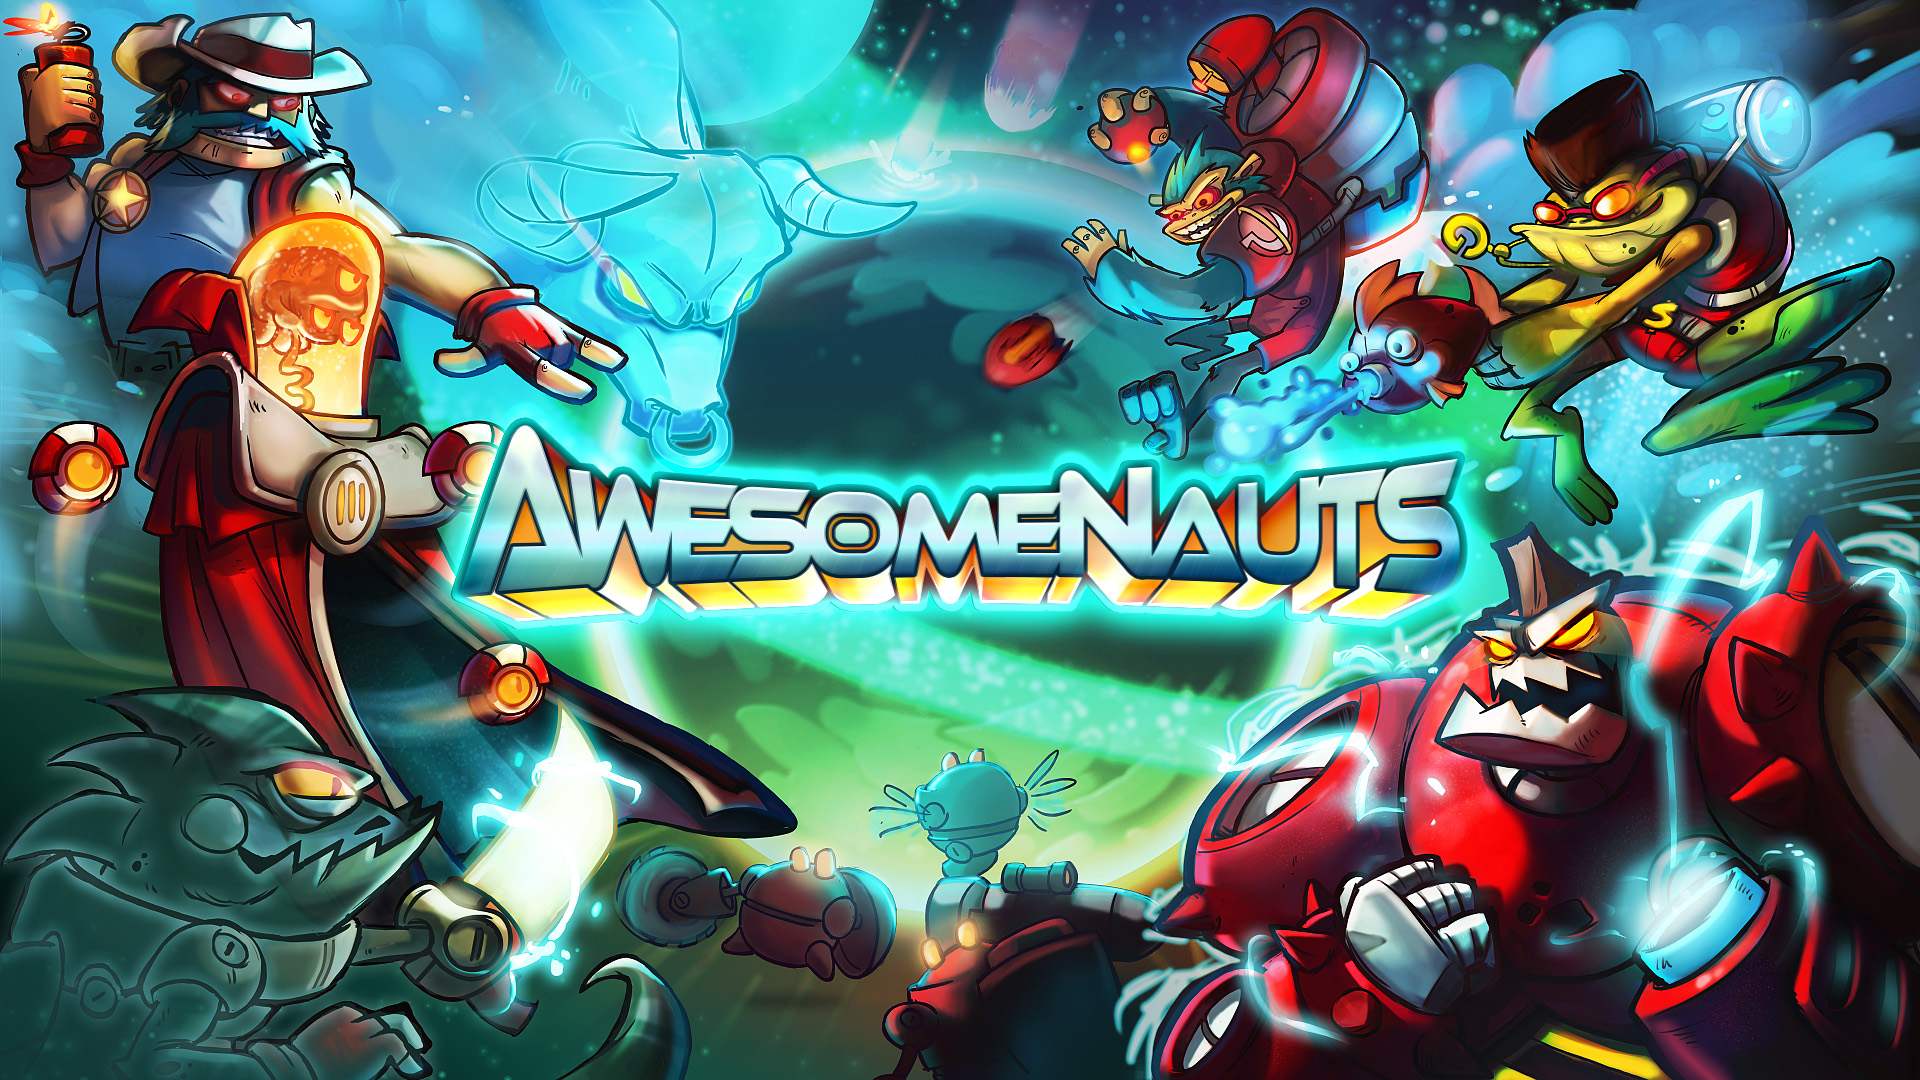 http://thegamefanatics.com/wp-content/uploads/2012/08/Awesomenauts_1_1920x1080.jpg